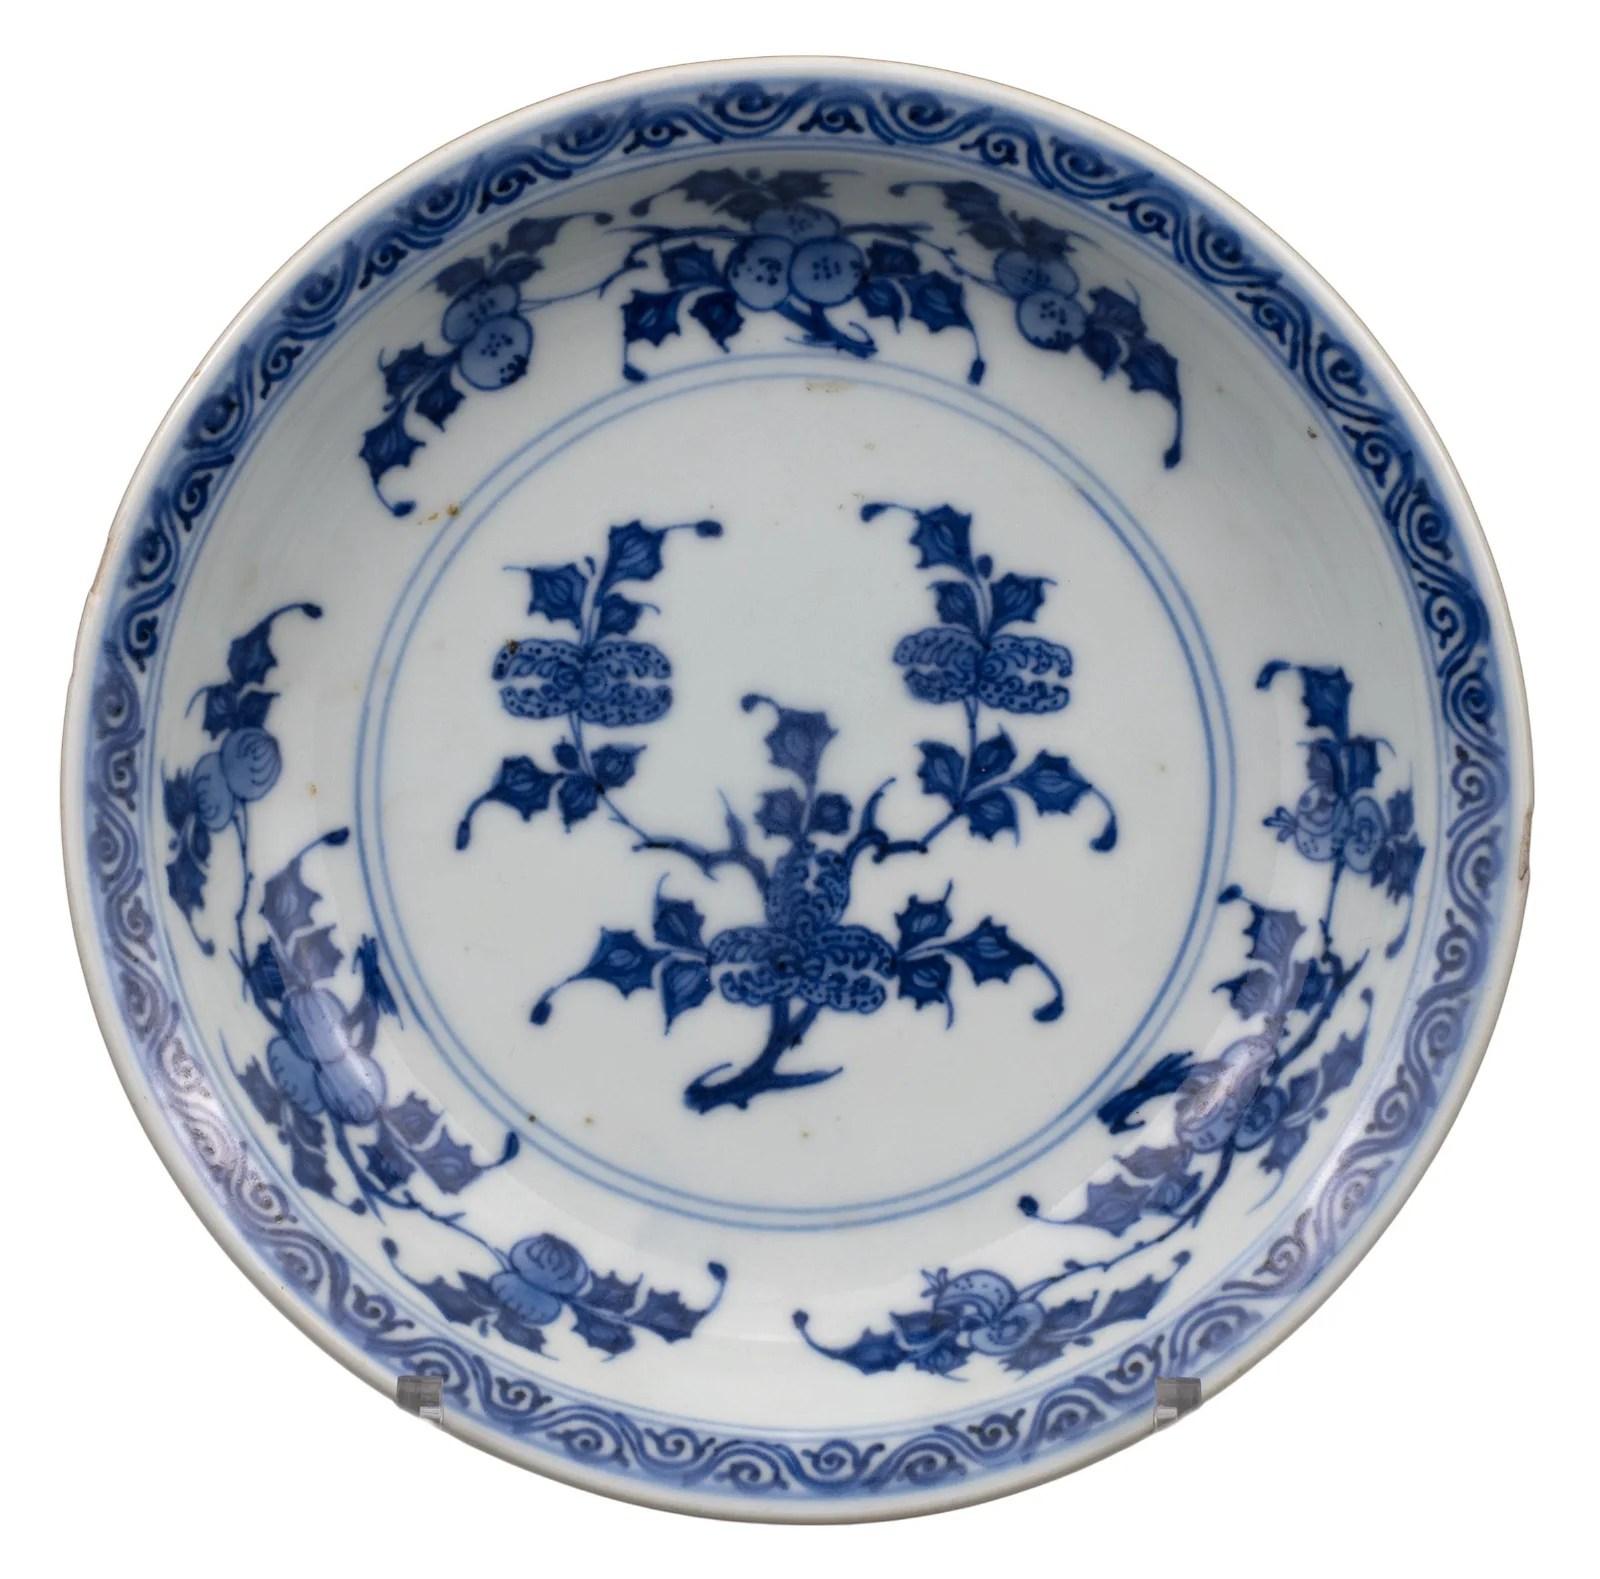 CHINESE BLUE AND WHITE 'THREE ABUNDANCES' PORCELAIN